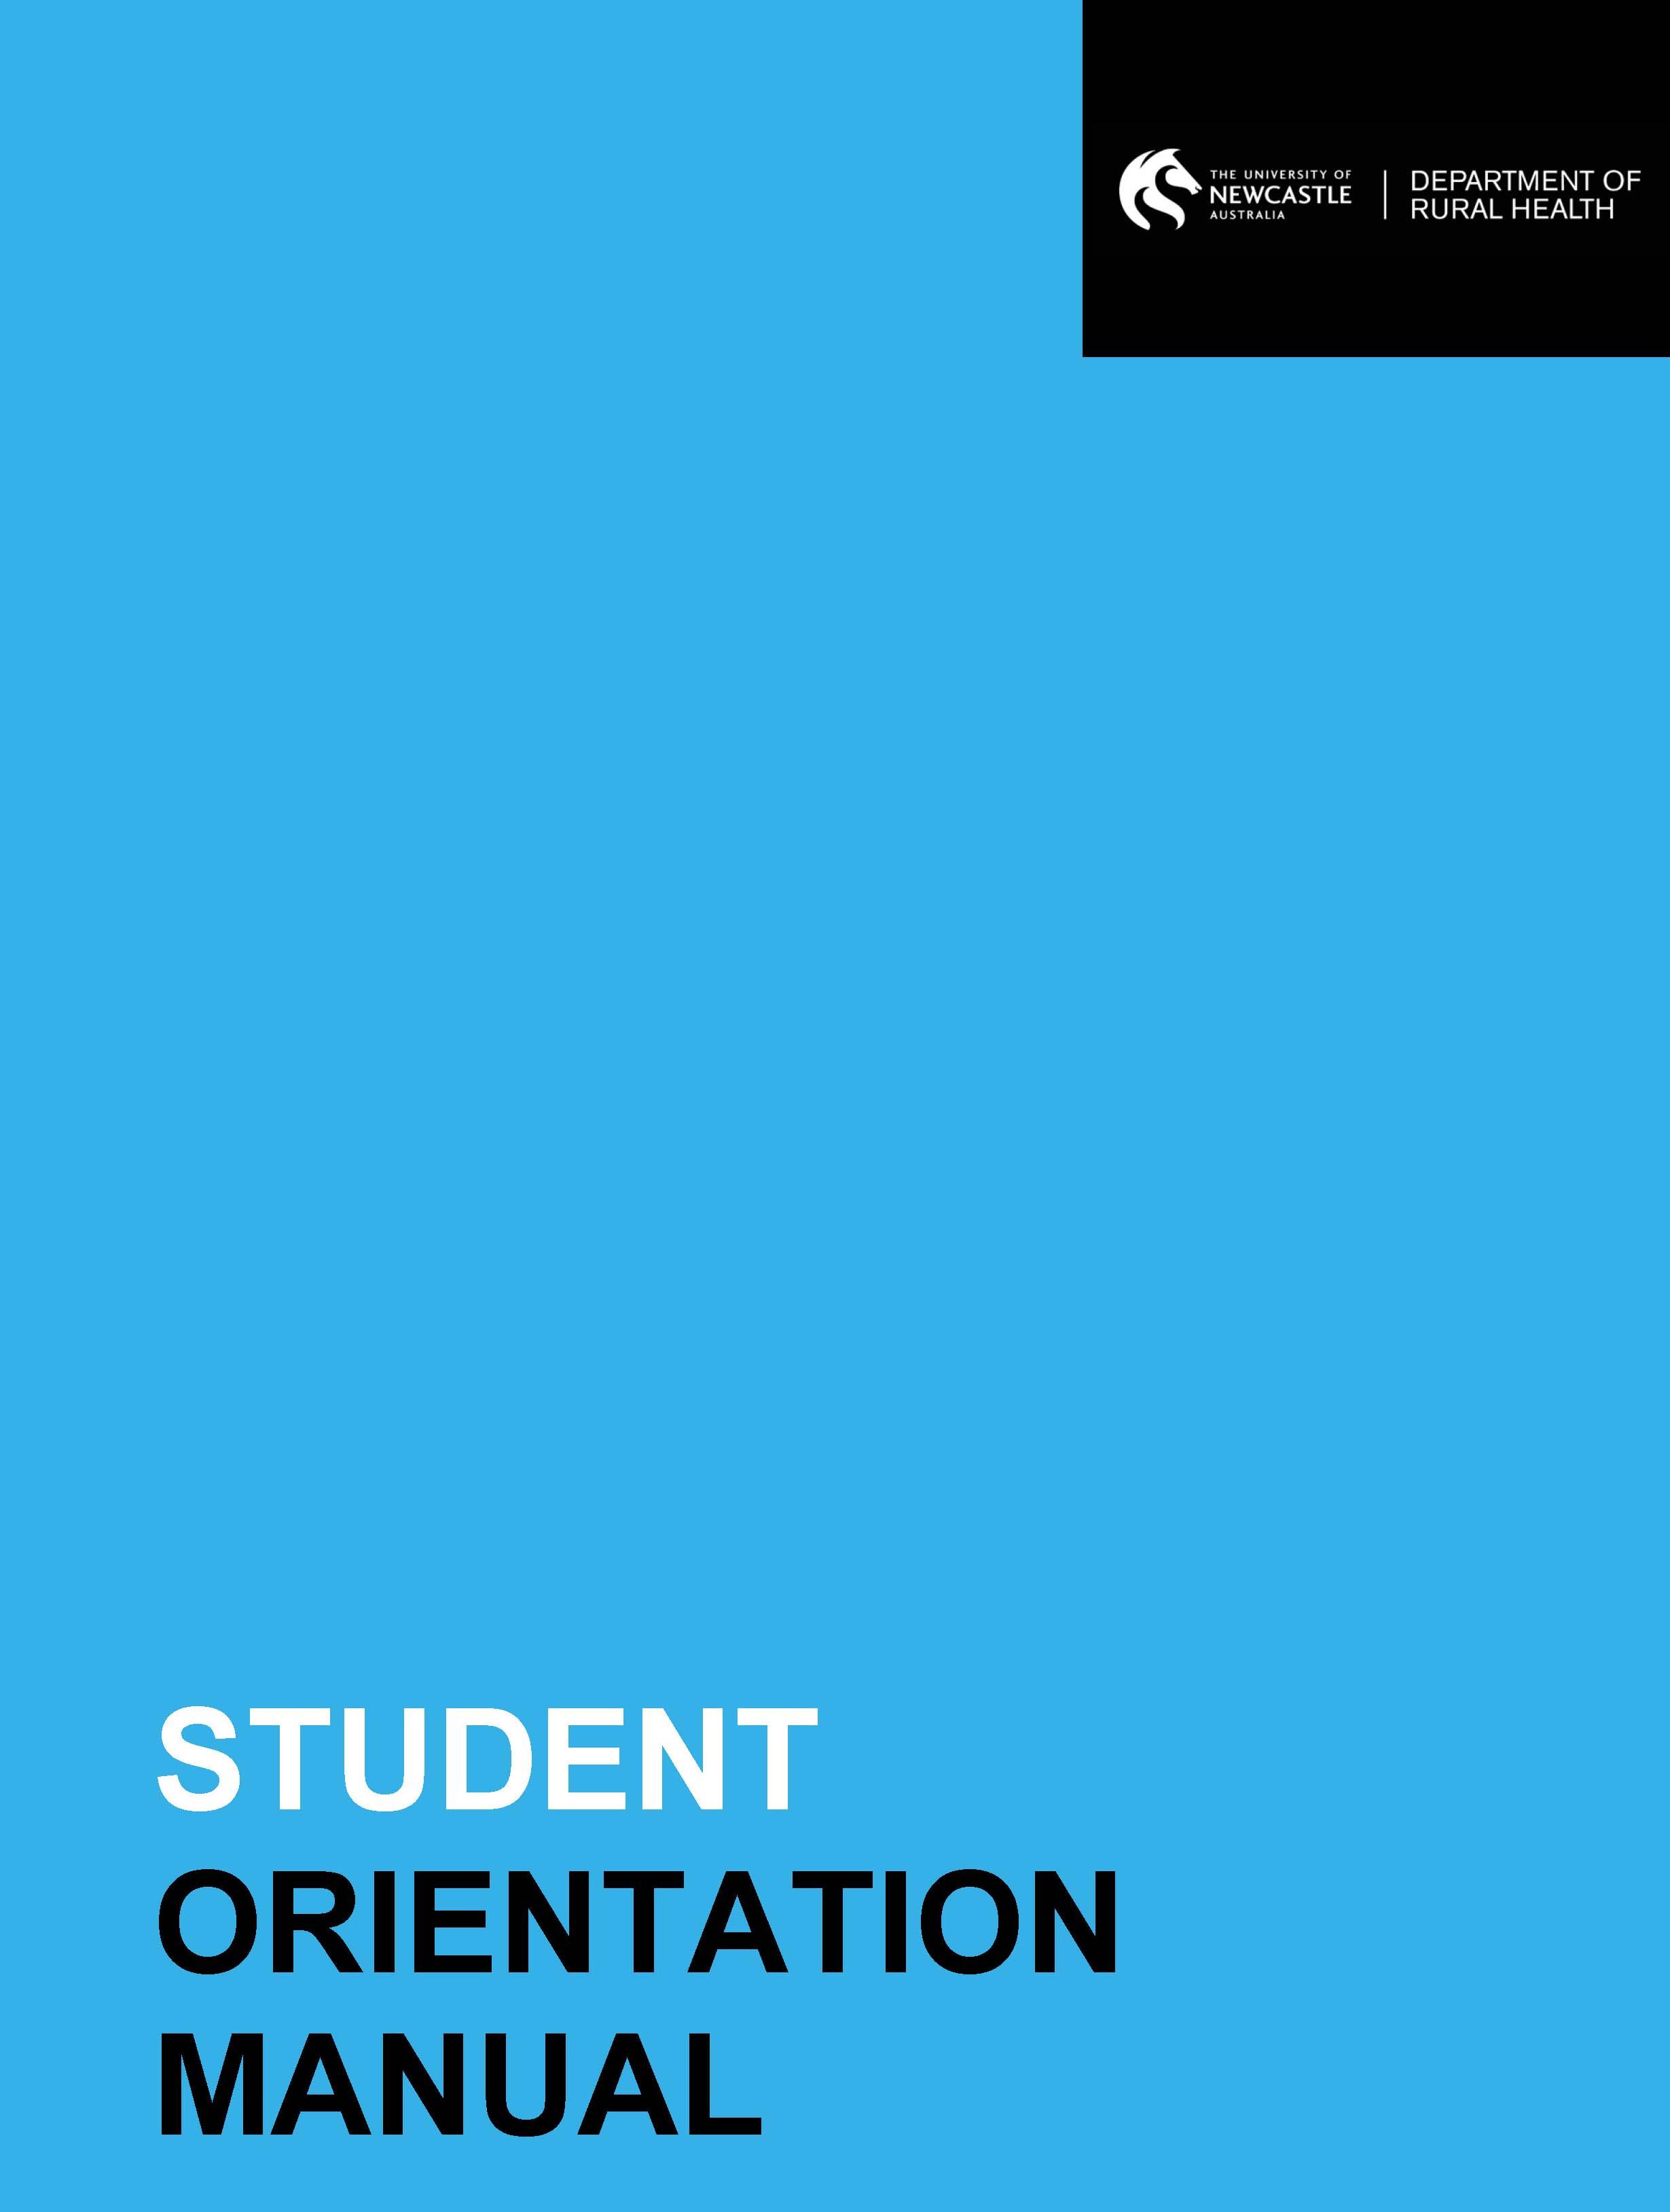 Student Orientation Manual